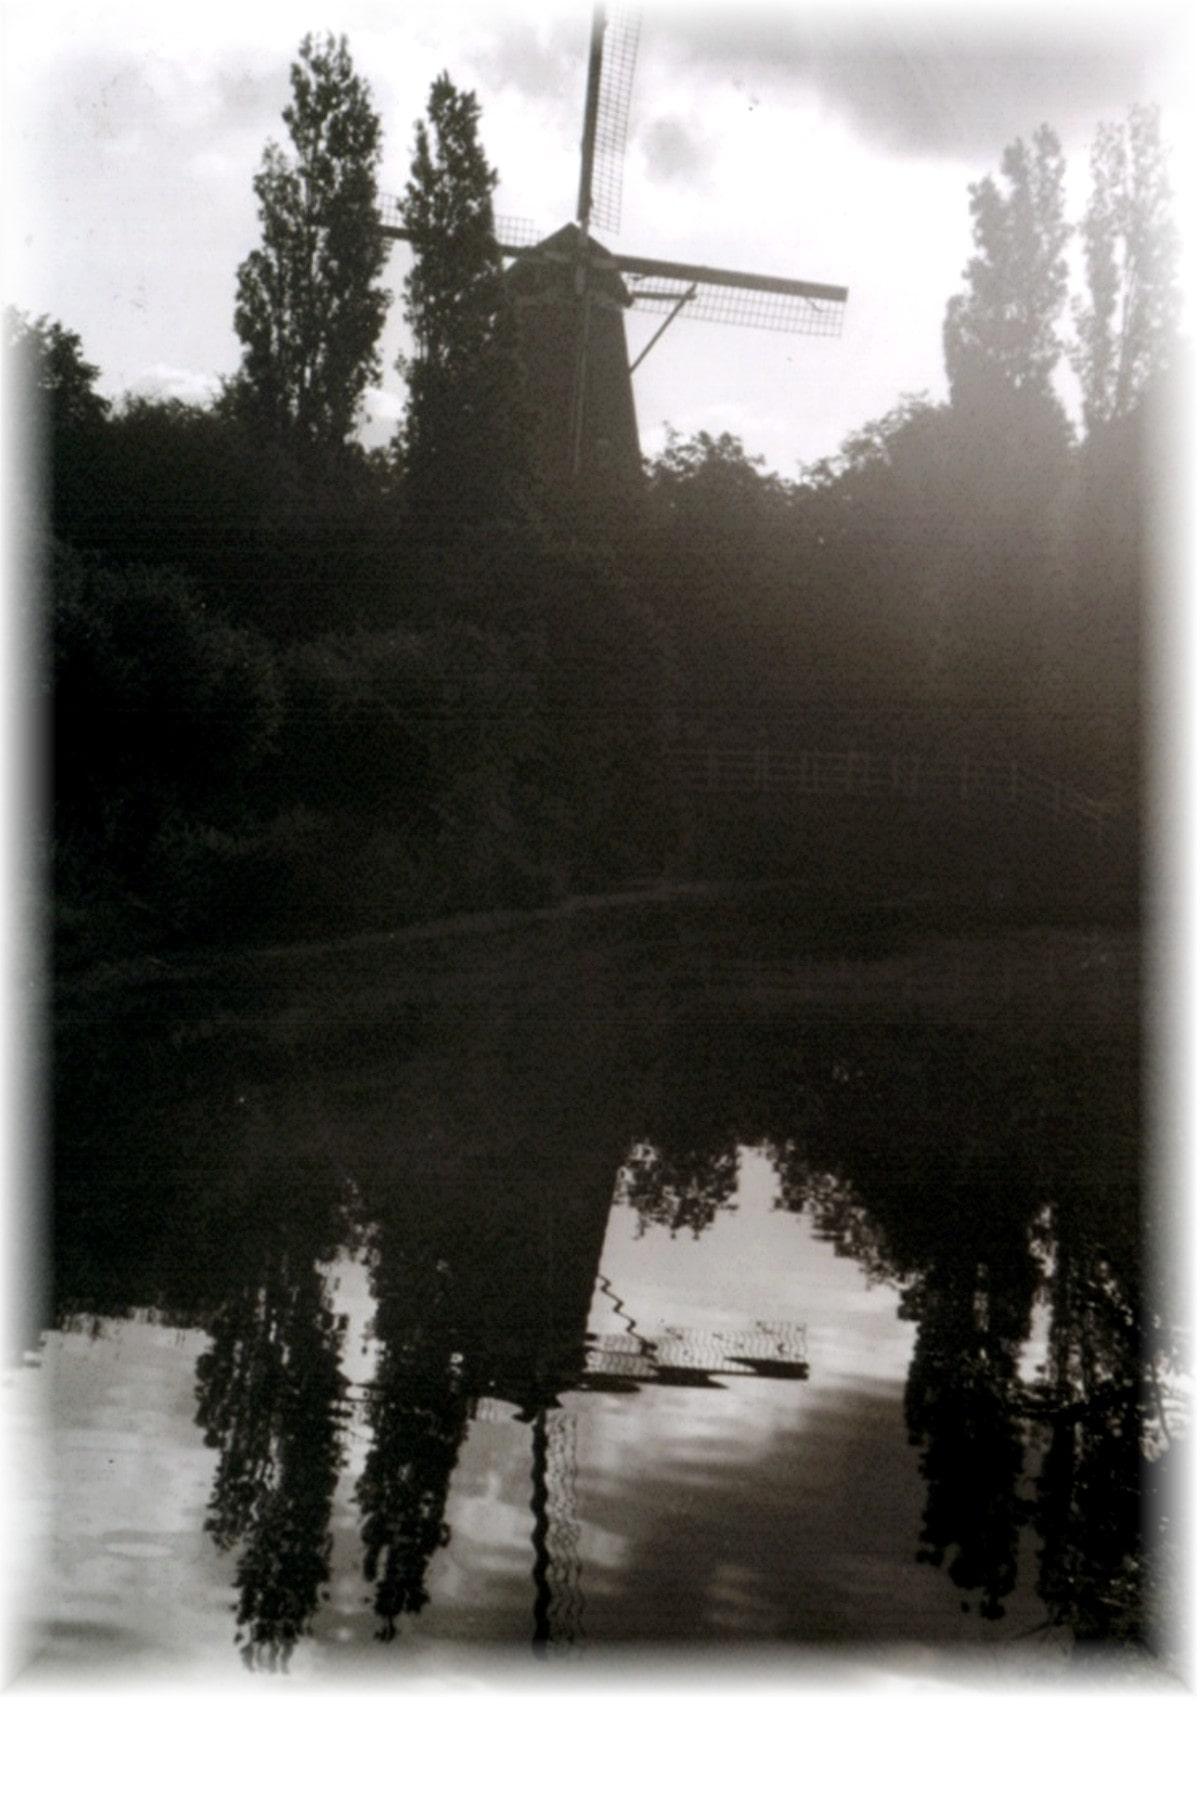 Netherlands, wind mill, reflection, lake